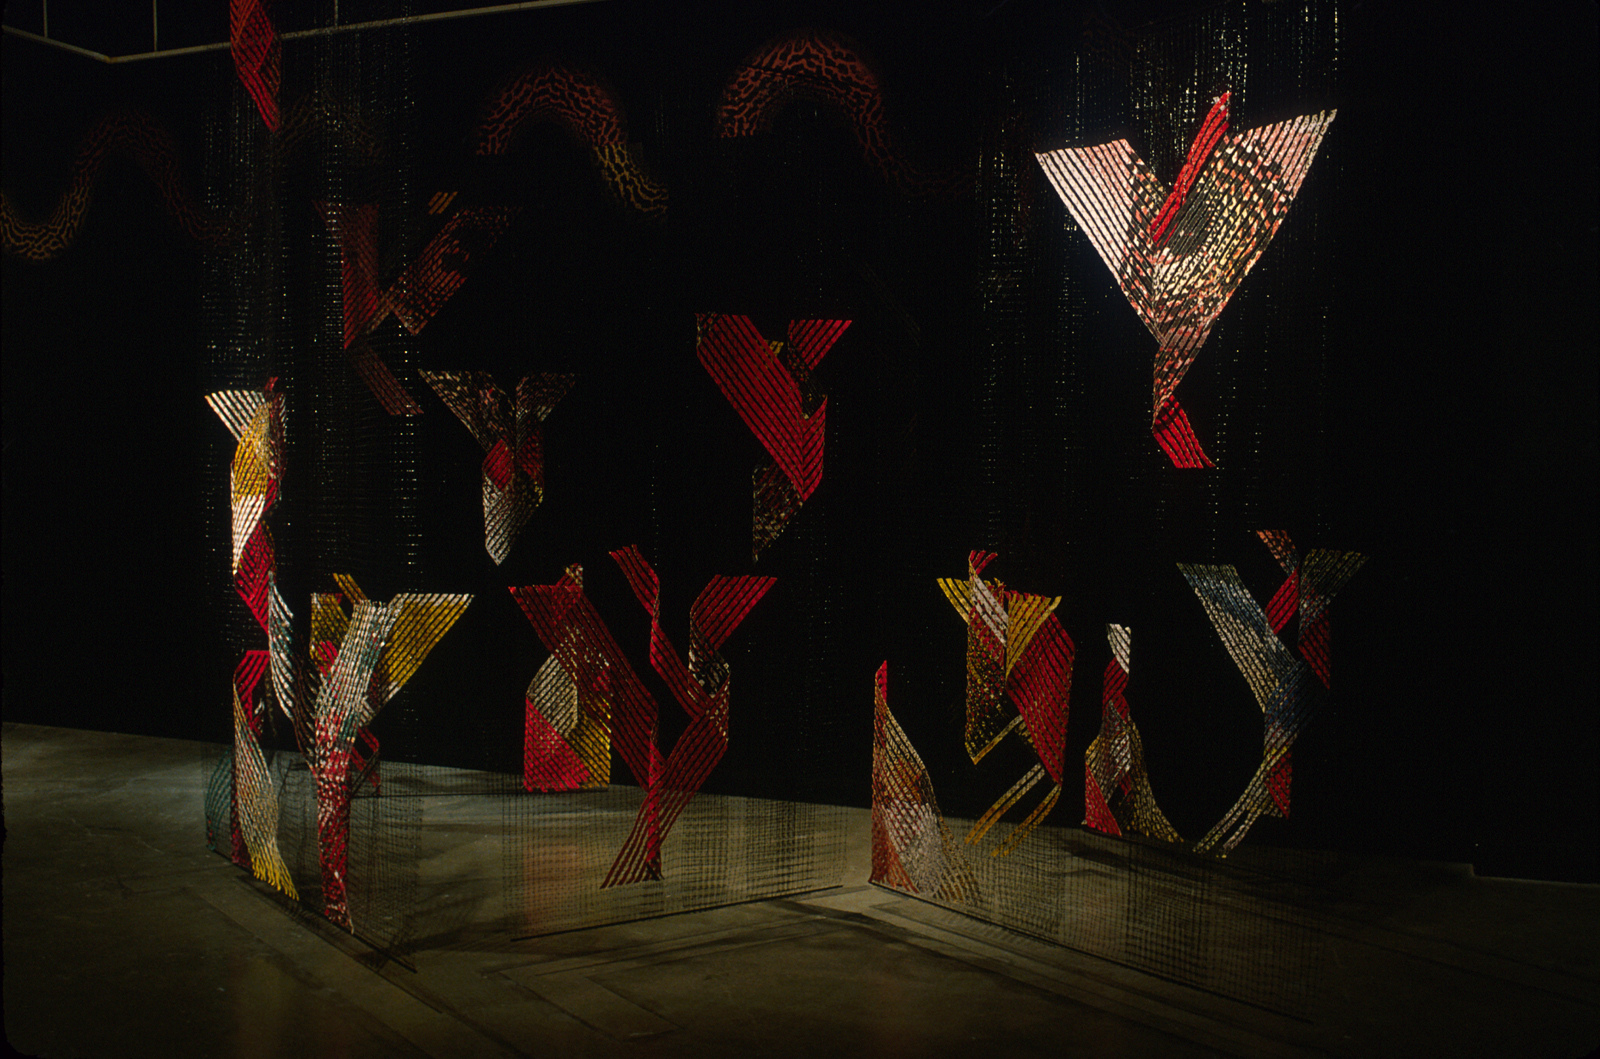 GERHARDT KNODEL Installation Work 1989-1997 Walls, a gallery installation